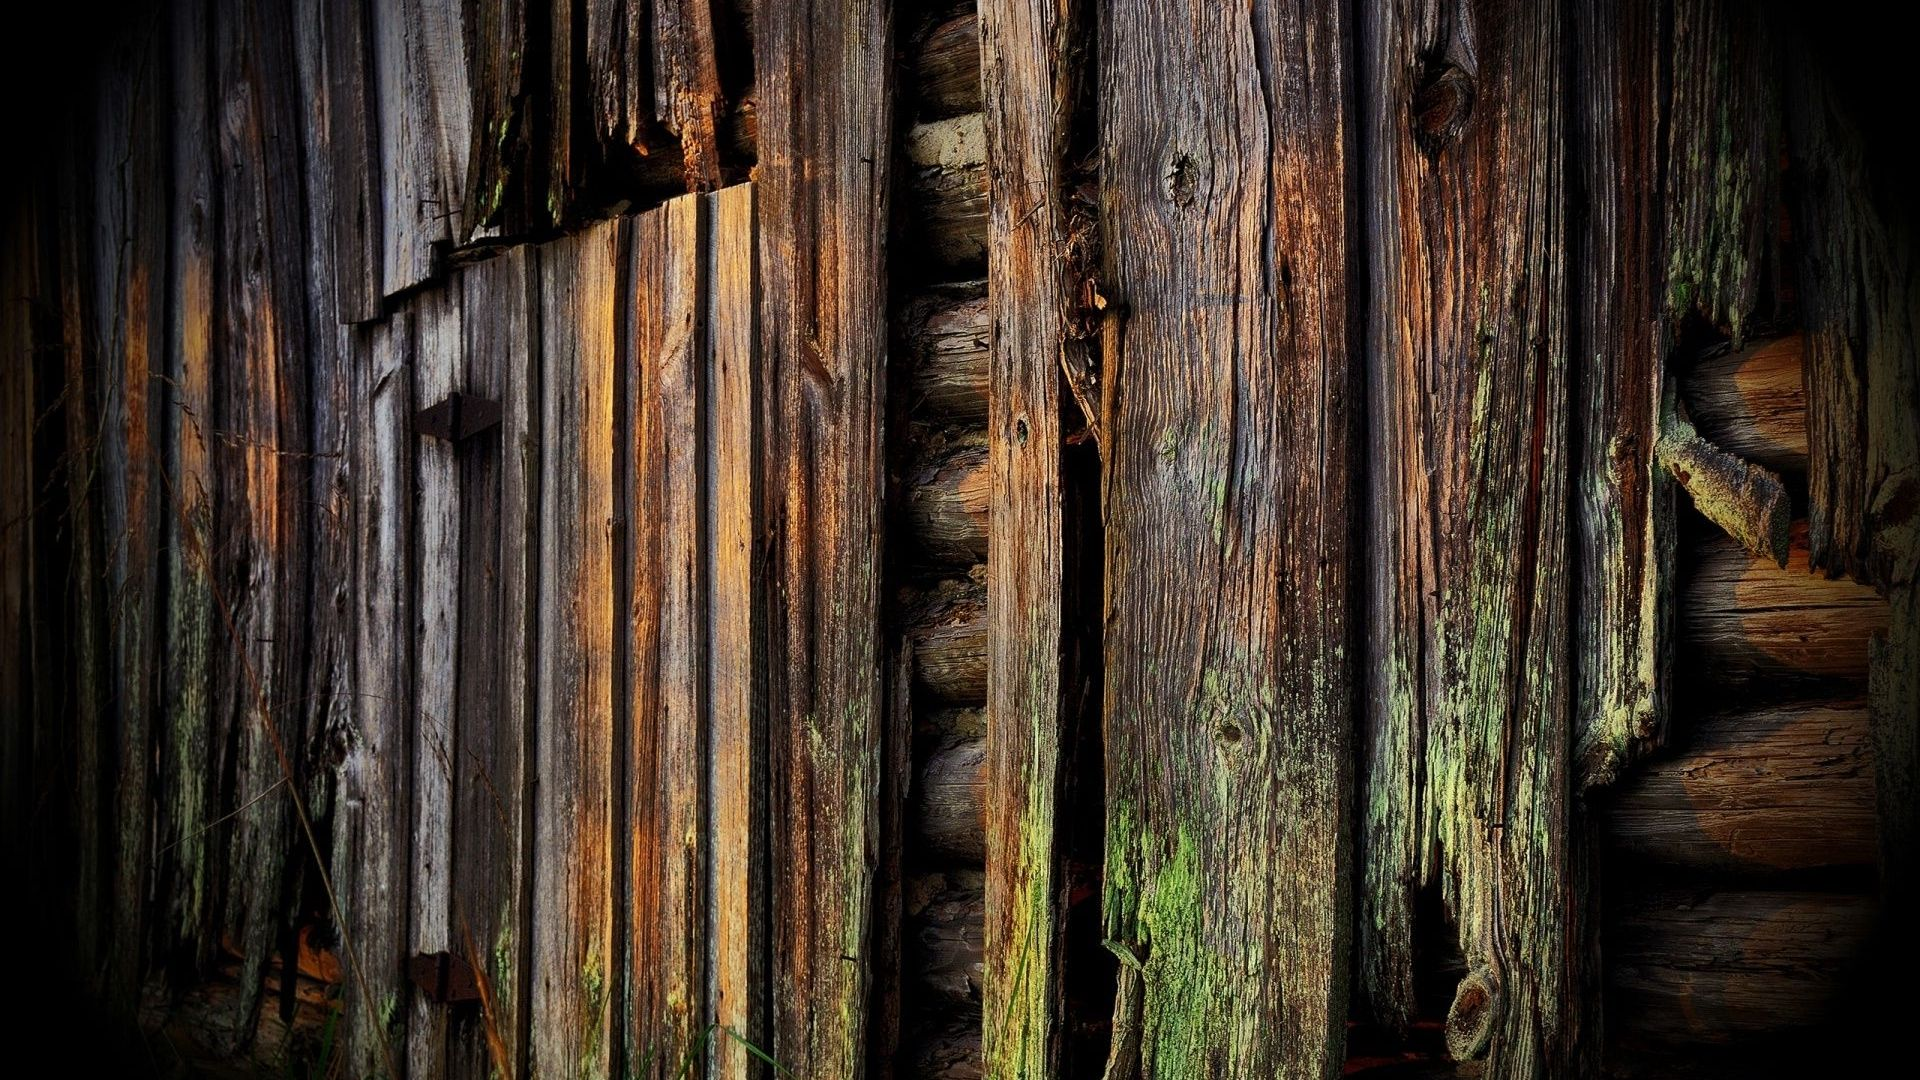 Hd Wallpaper Wood Cool Wallpapers 1920x1080